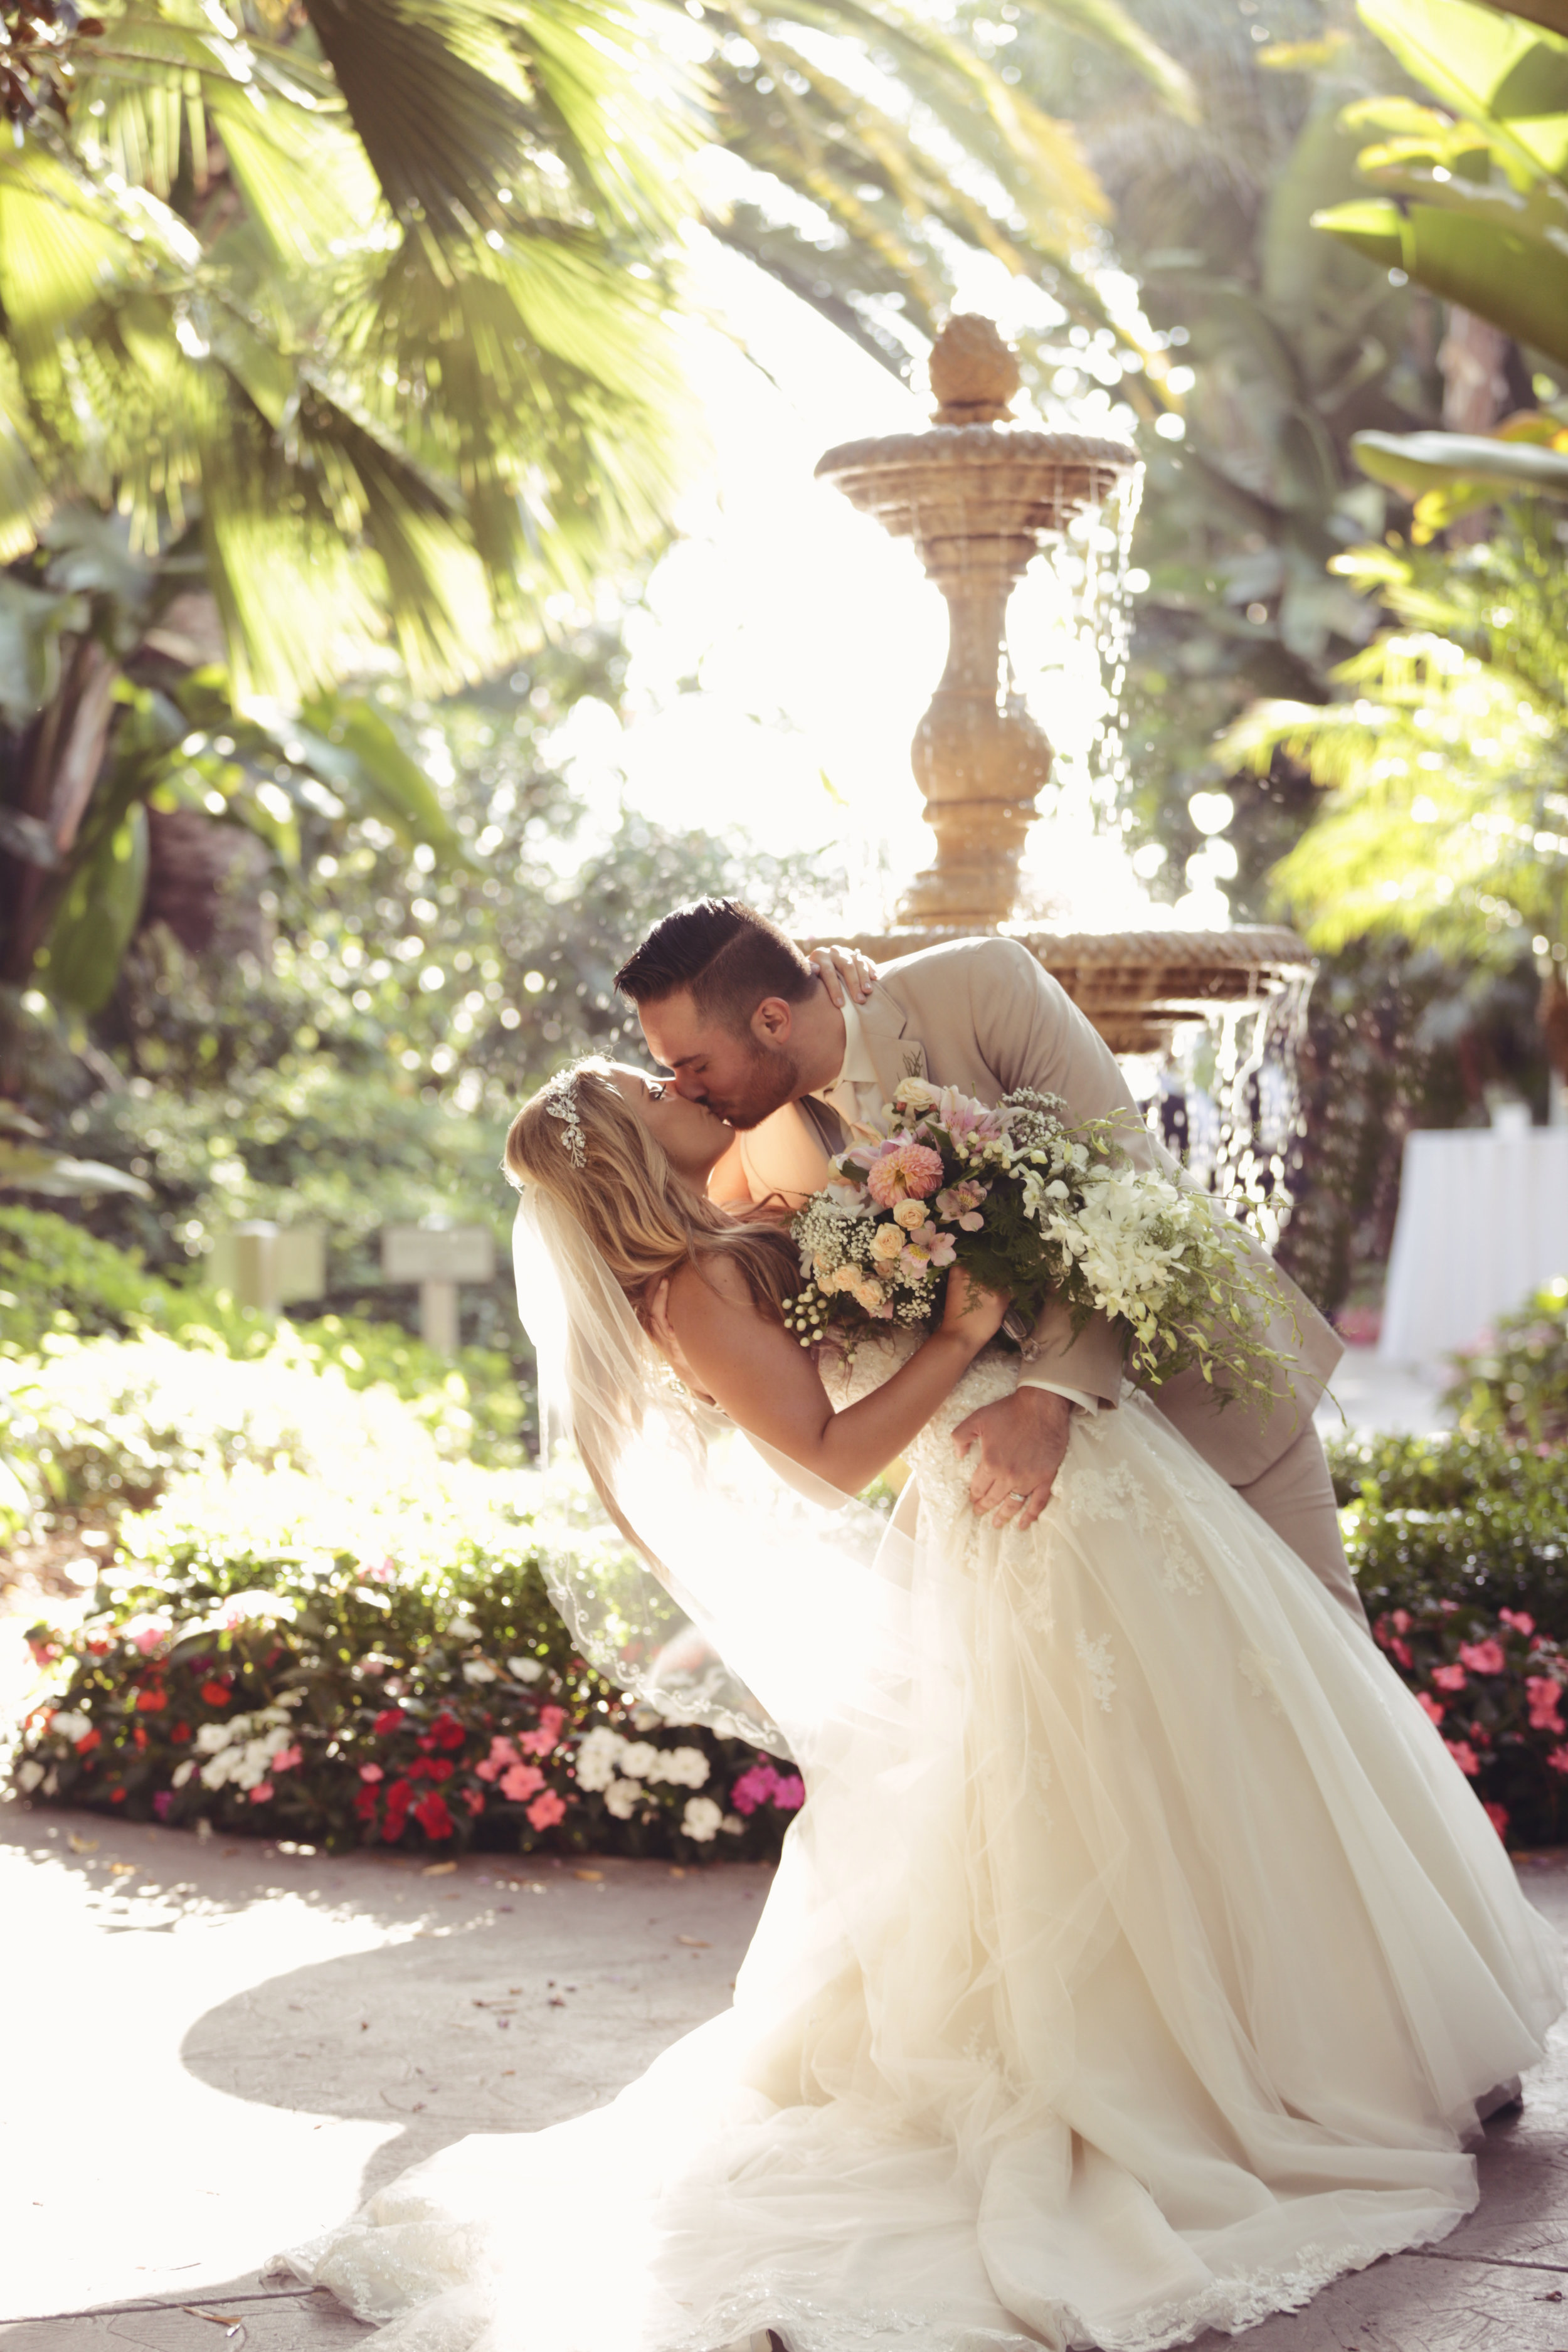 Fallbrook, CA Wedding Venue - The Grand Tradition Wedding - Astray Photography | Wedding Blog-The Overwhelmed Bride